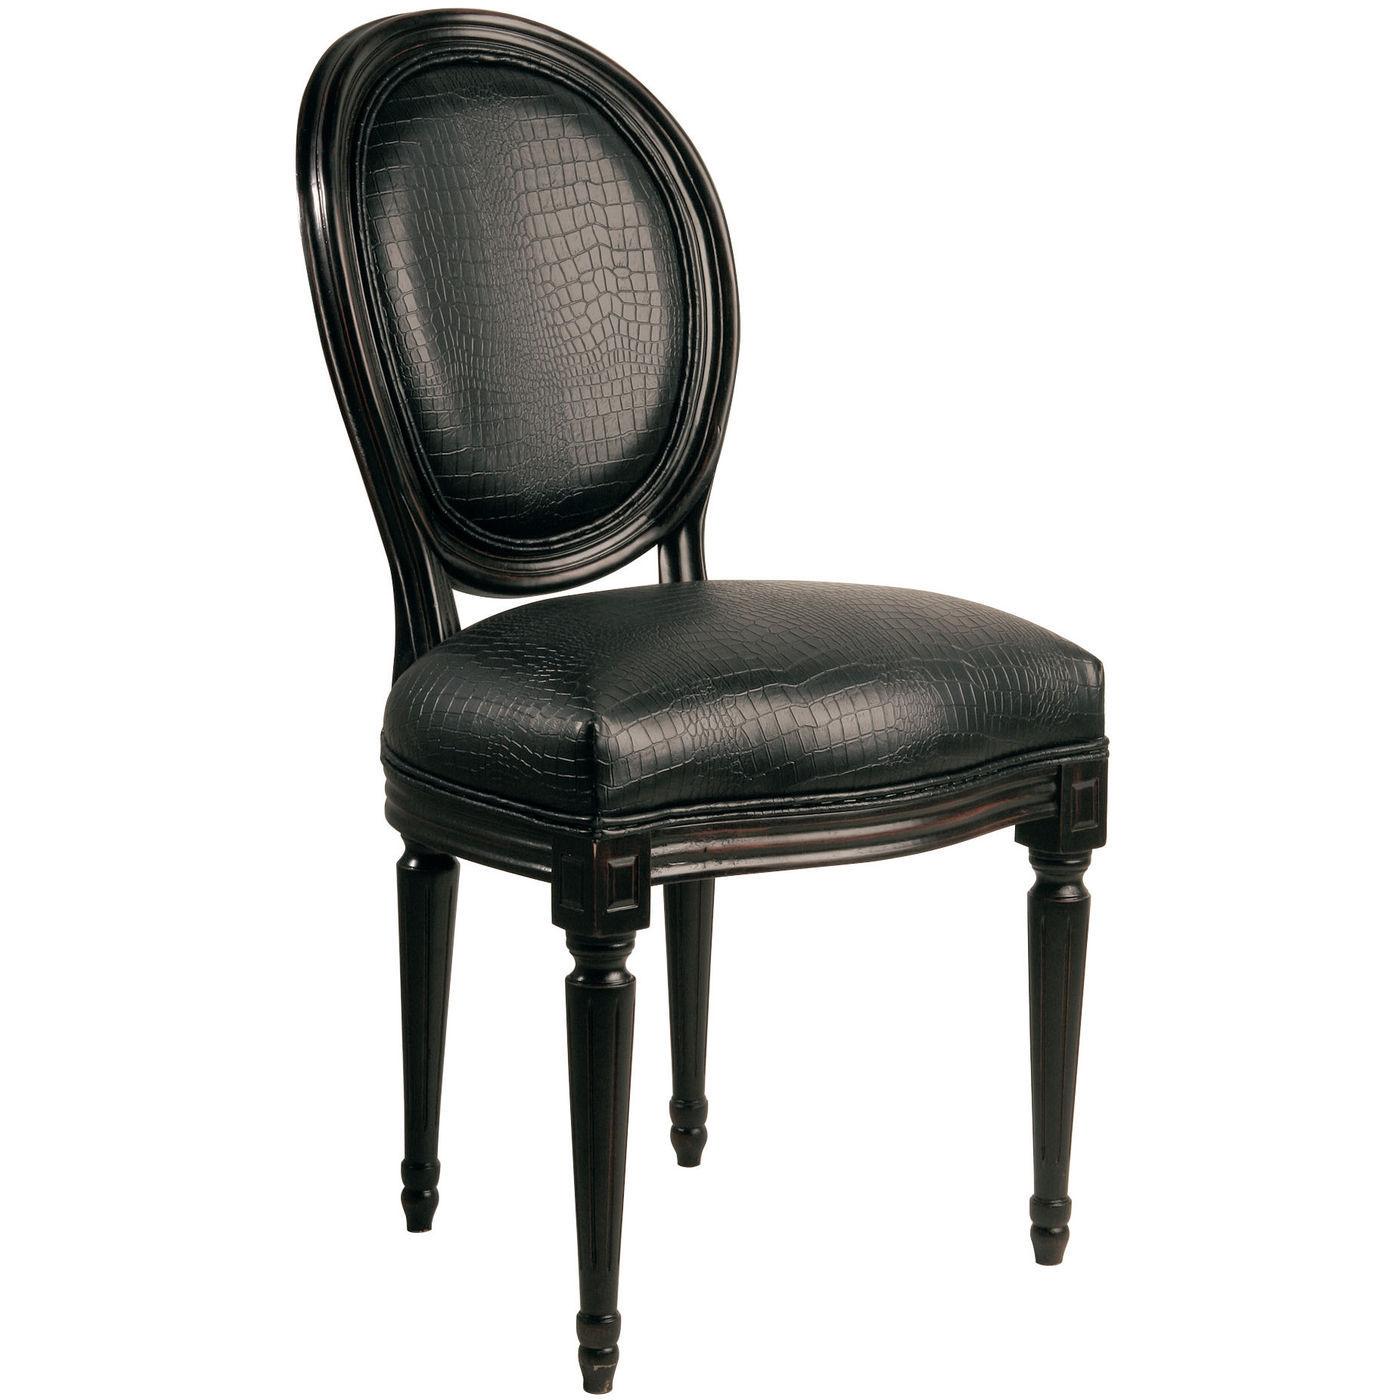 Stol louis croco black for Kare design stuhl louis